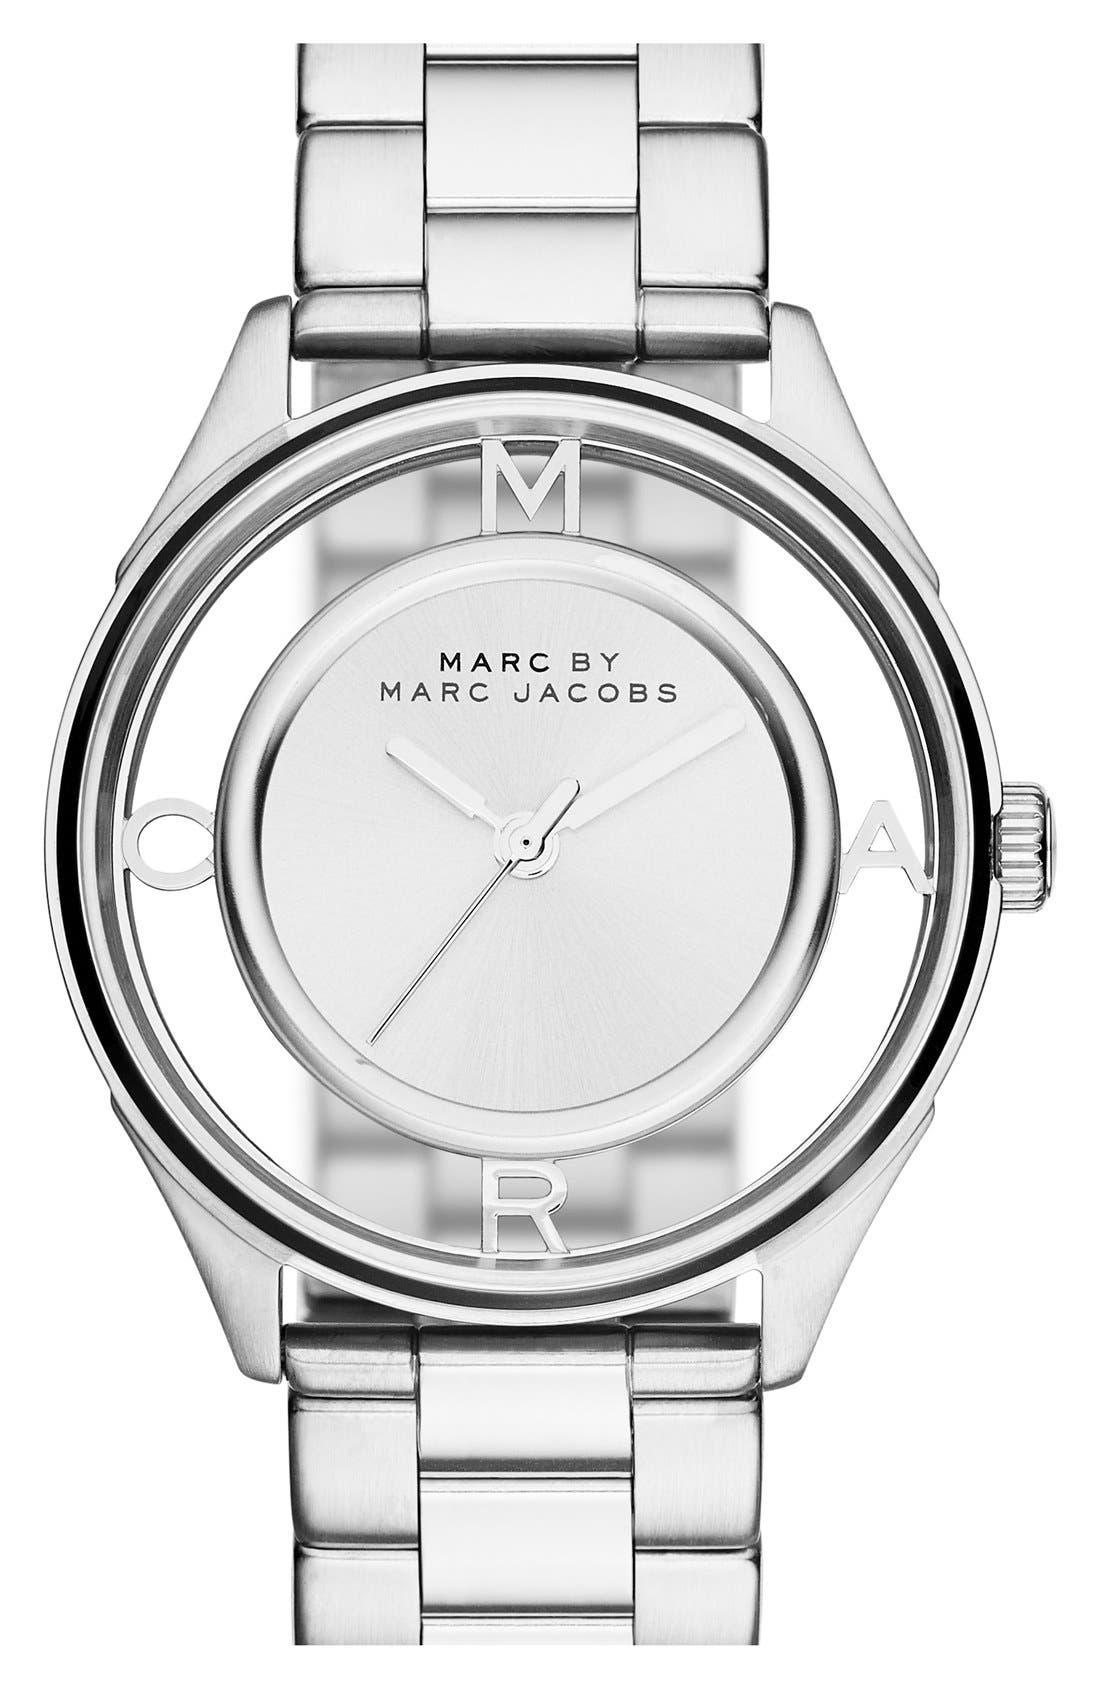 Main Image - MARC JACOBS 'Tether' Skeleton Bracelet Watch, 36mm